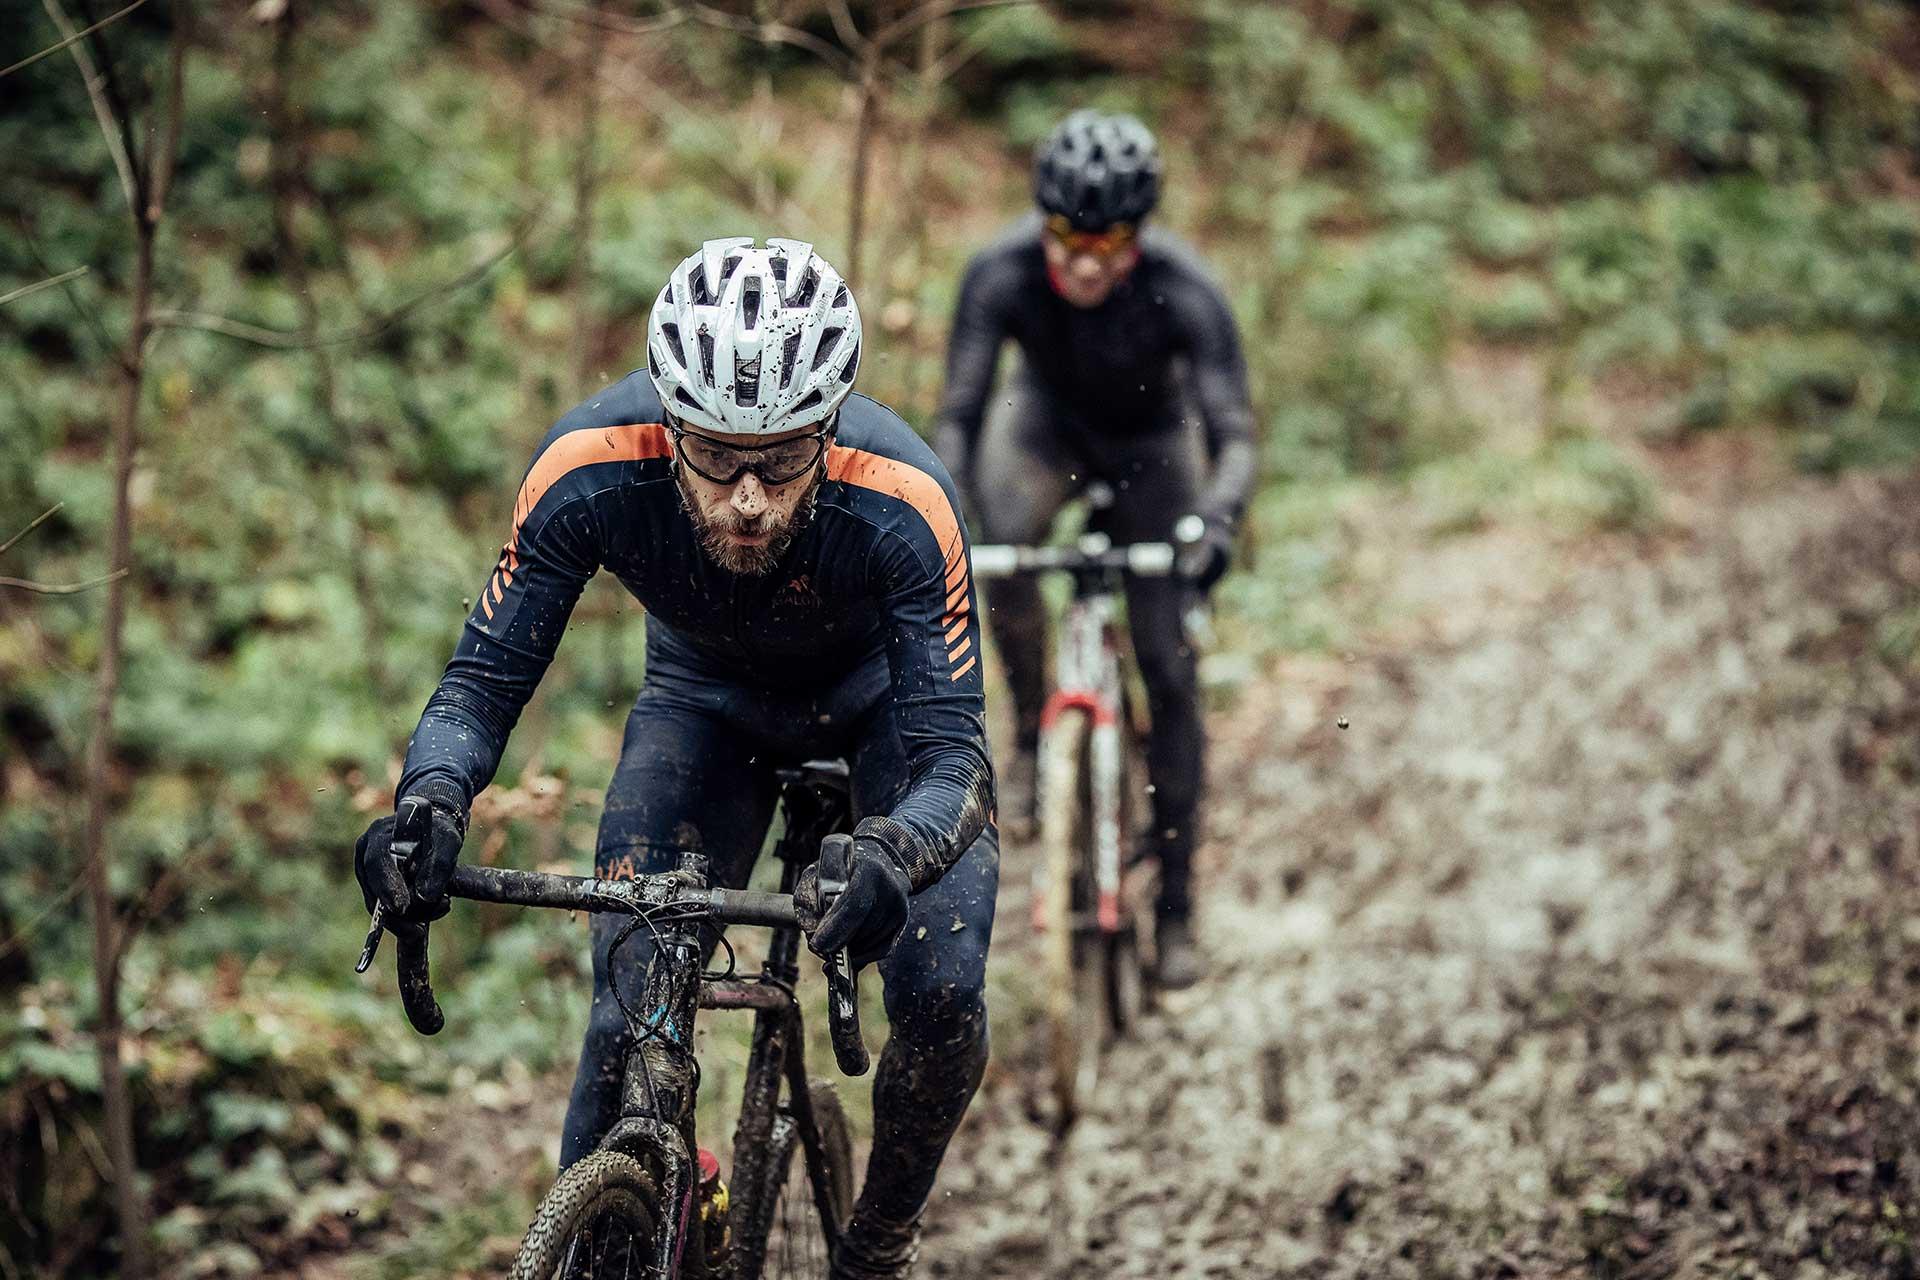 fotograf crossbike sport schlamm wald deutschland berlin fotoshooting